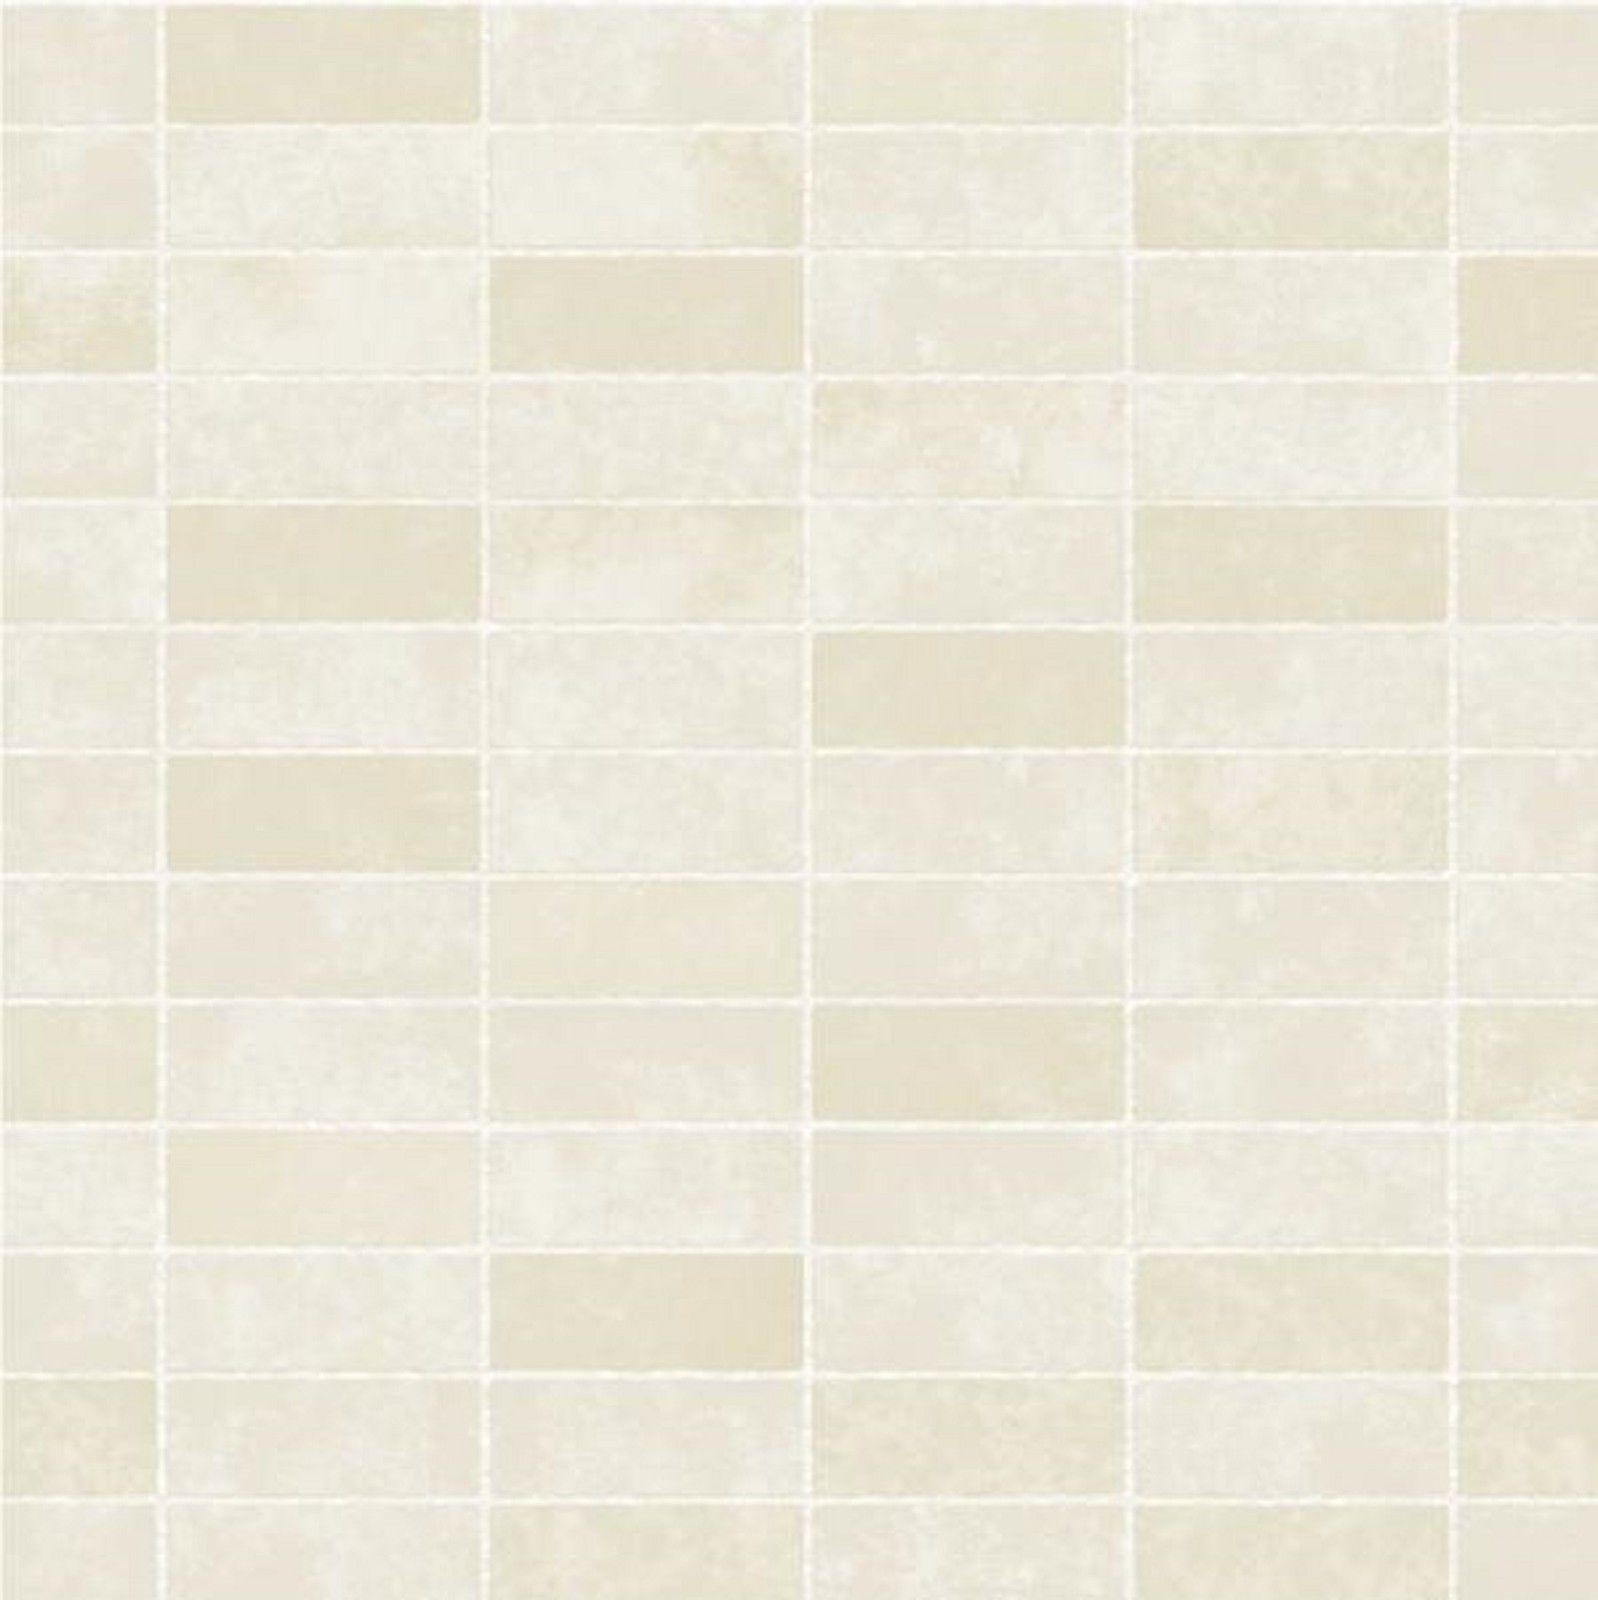 Wallpaper Kitchen Similiar Kitchen Wallpaper Samples Keywords